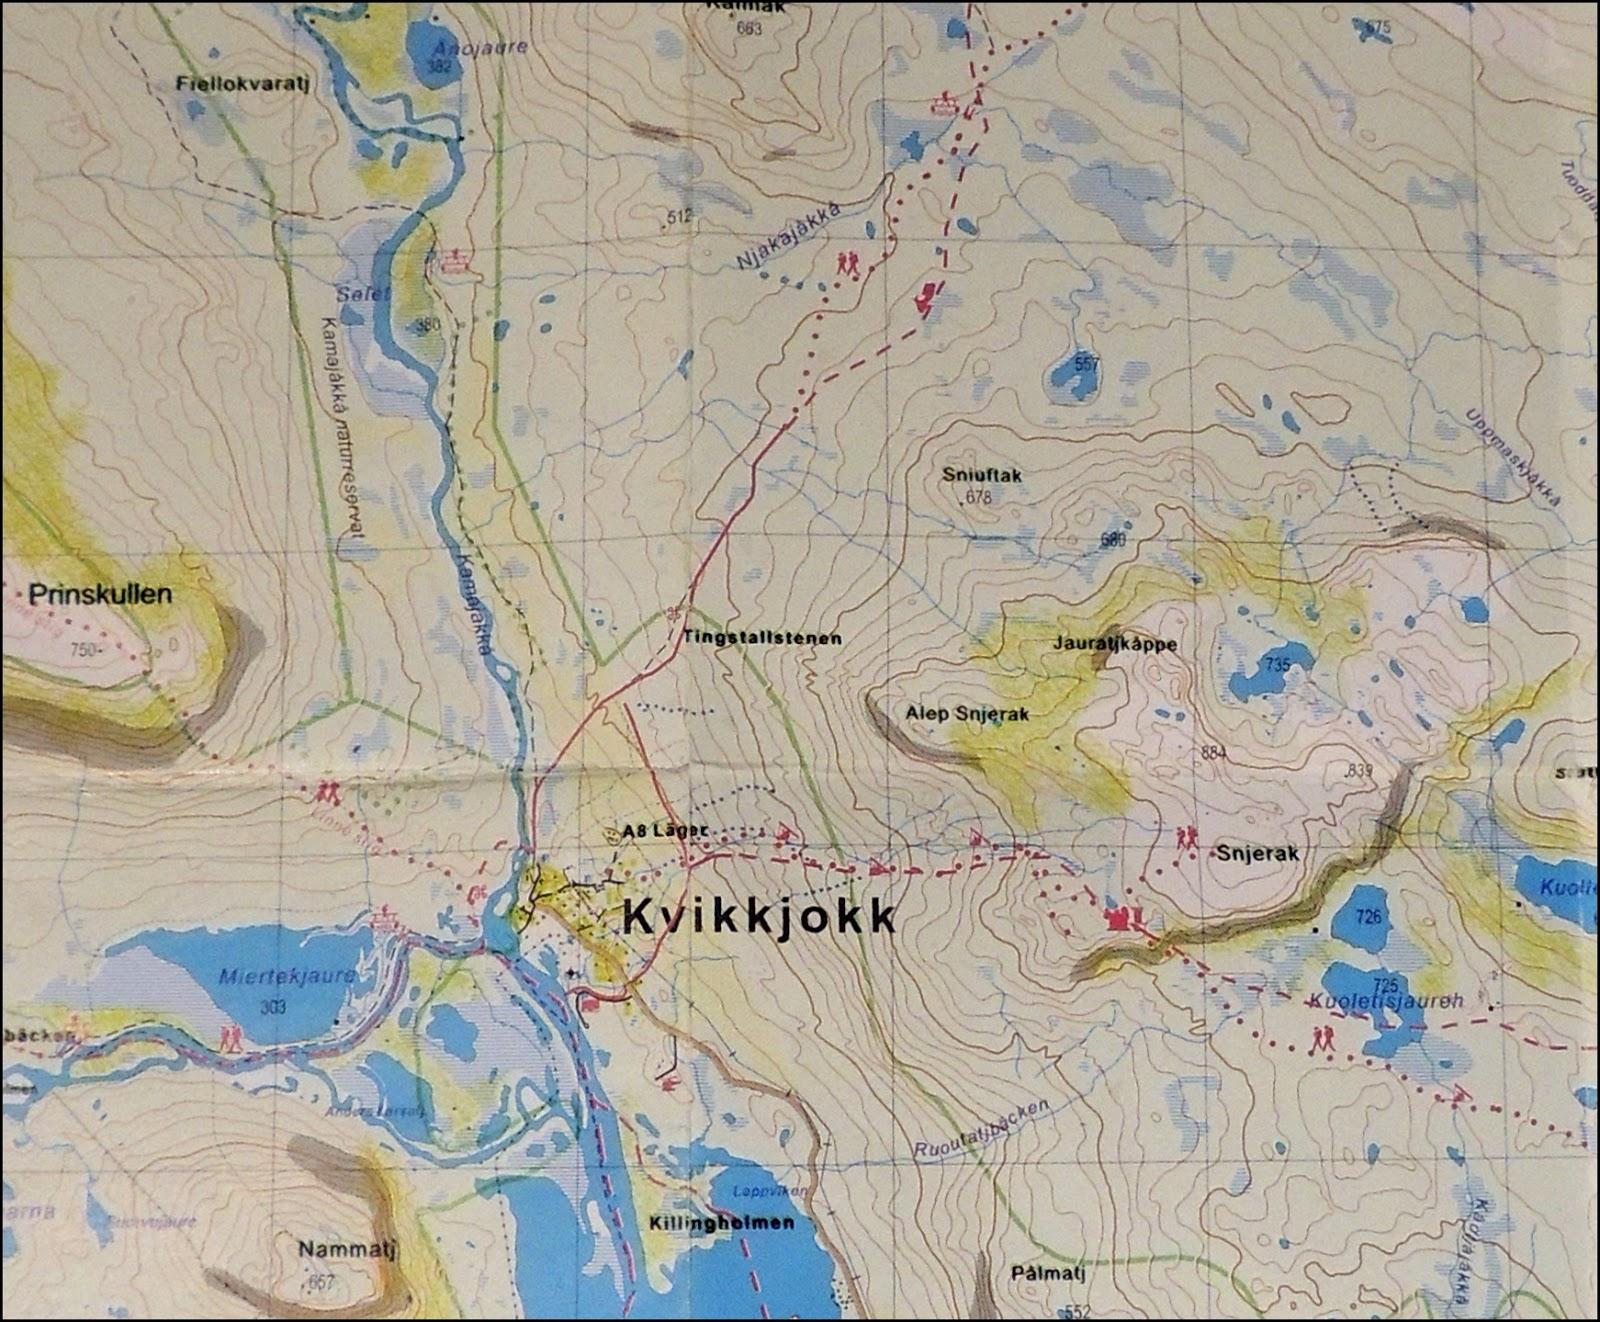 kvikkjokk guys Kungsleden and kebnekaise rowing boats is not necessary between kebnats and kvikkjokk i dashed uphill where 3 swedish guys asked if i was missing something.